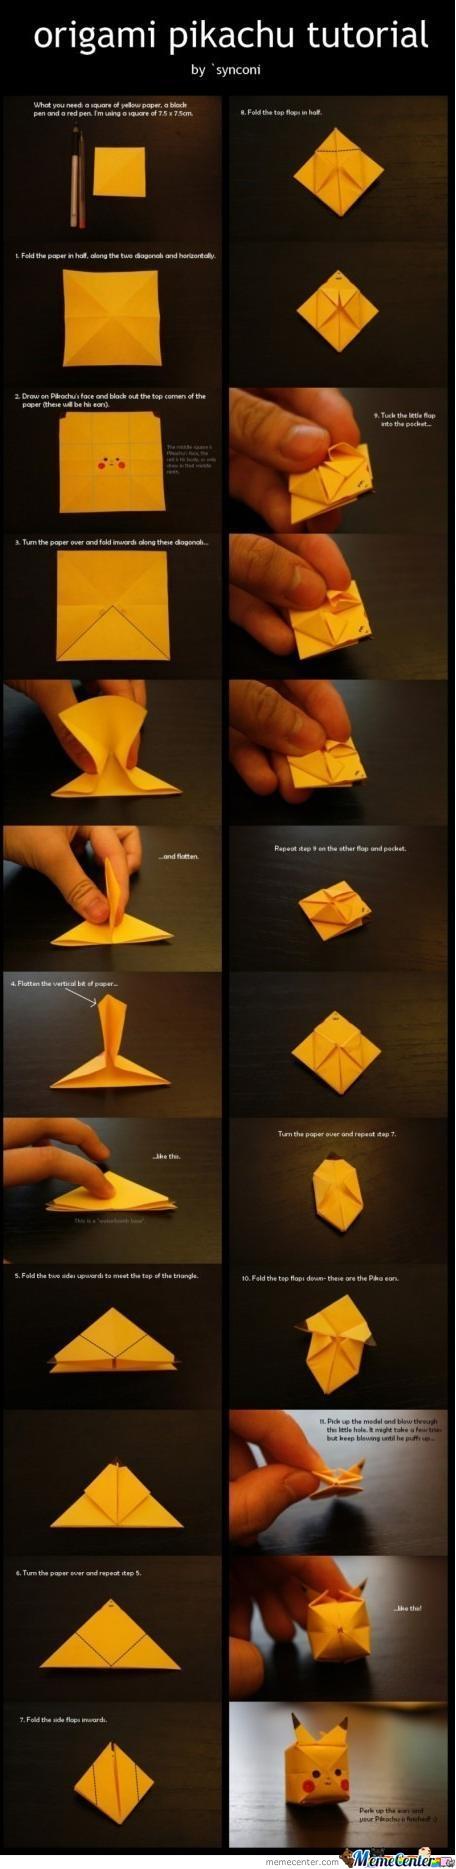 Raw Fox Origami Advanced Instructions Diagram 941k Foxgoguspathpdf 646k Fuchs96pdf 195k Fuchspdf 188k Hard Foxgif 93k Wily Werewolf